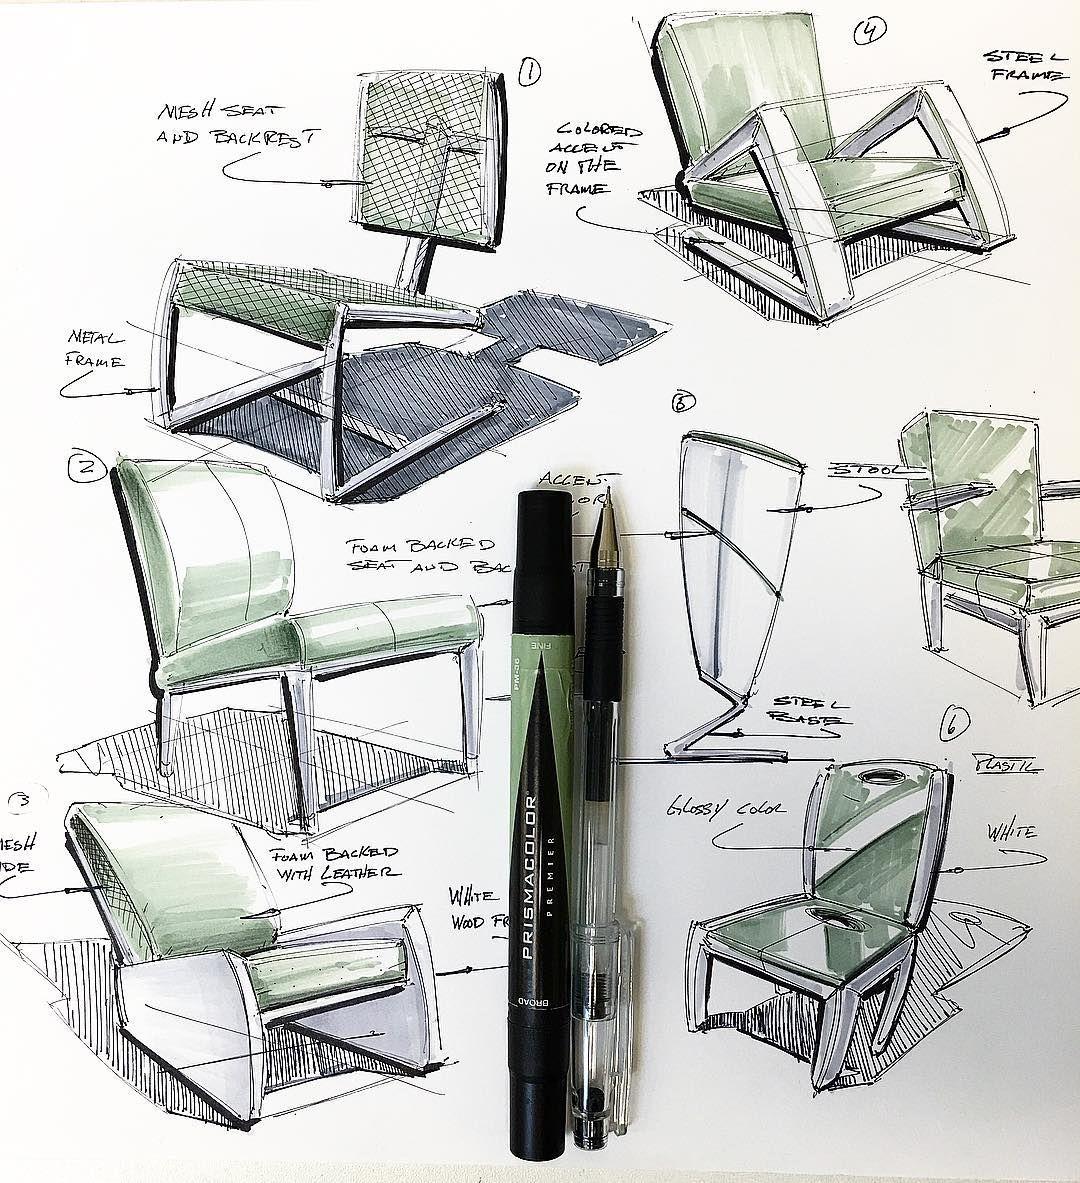 Joel Bell Industrial Design On Instagram A Quick Chair Markerdemo For My Productdesign Porfolio Diseno Bocetos De Diseno De Interiores Diseno Del Bosquejo